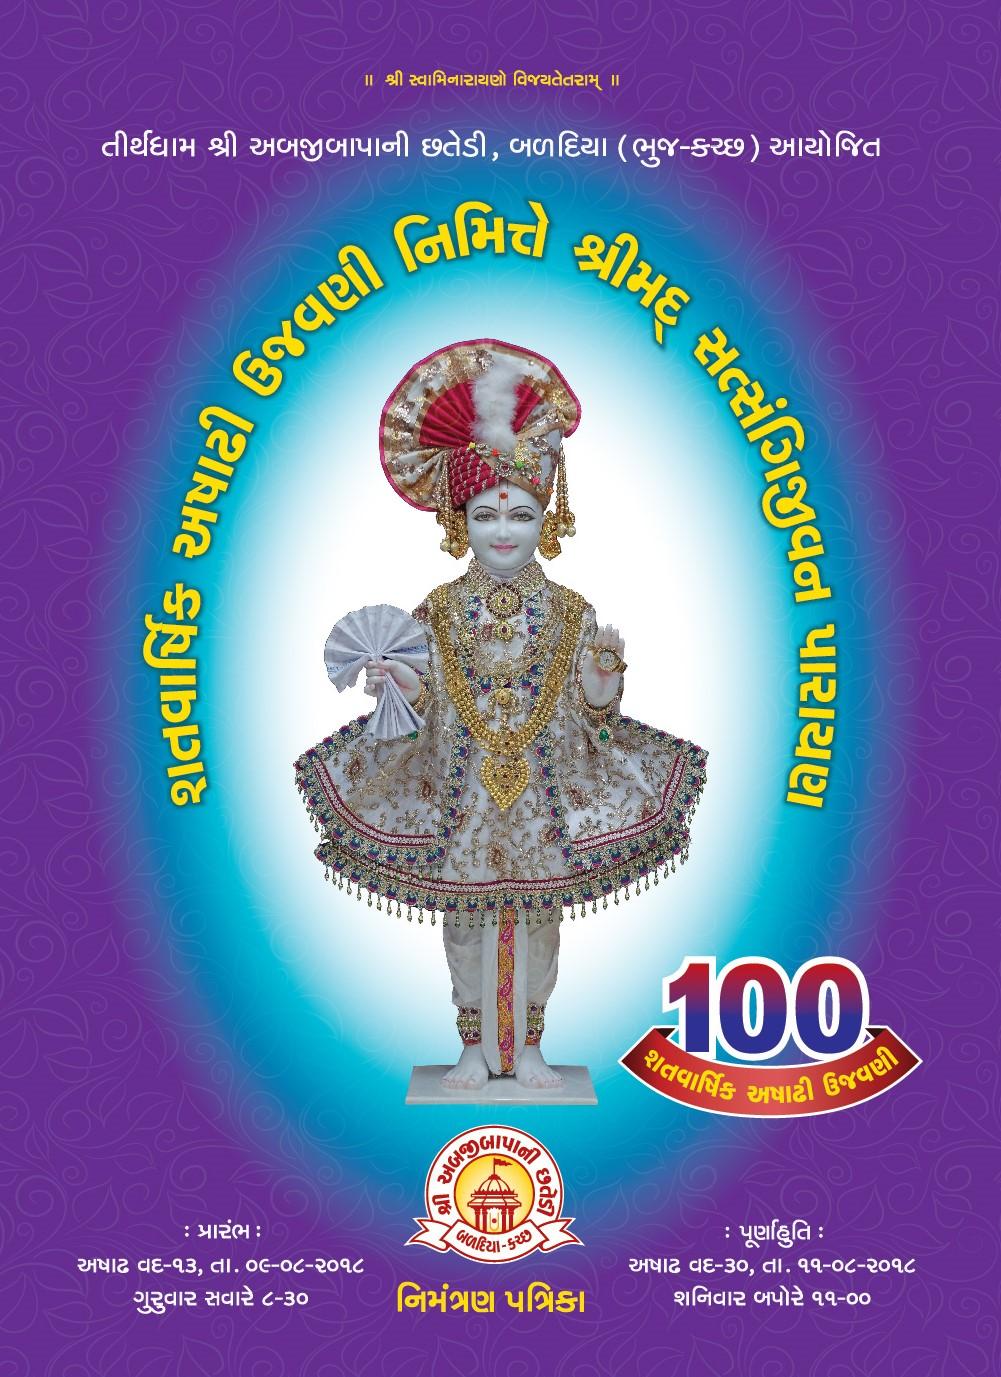 Ashadhi Ujavni nimite Shrimad Satsangijivan Parayan Dt: 09-08-2018 to 11-08-2018